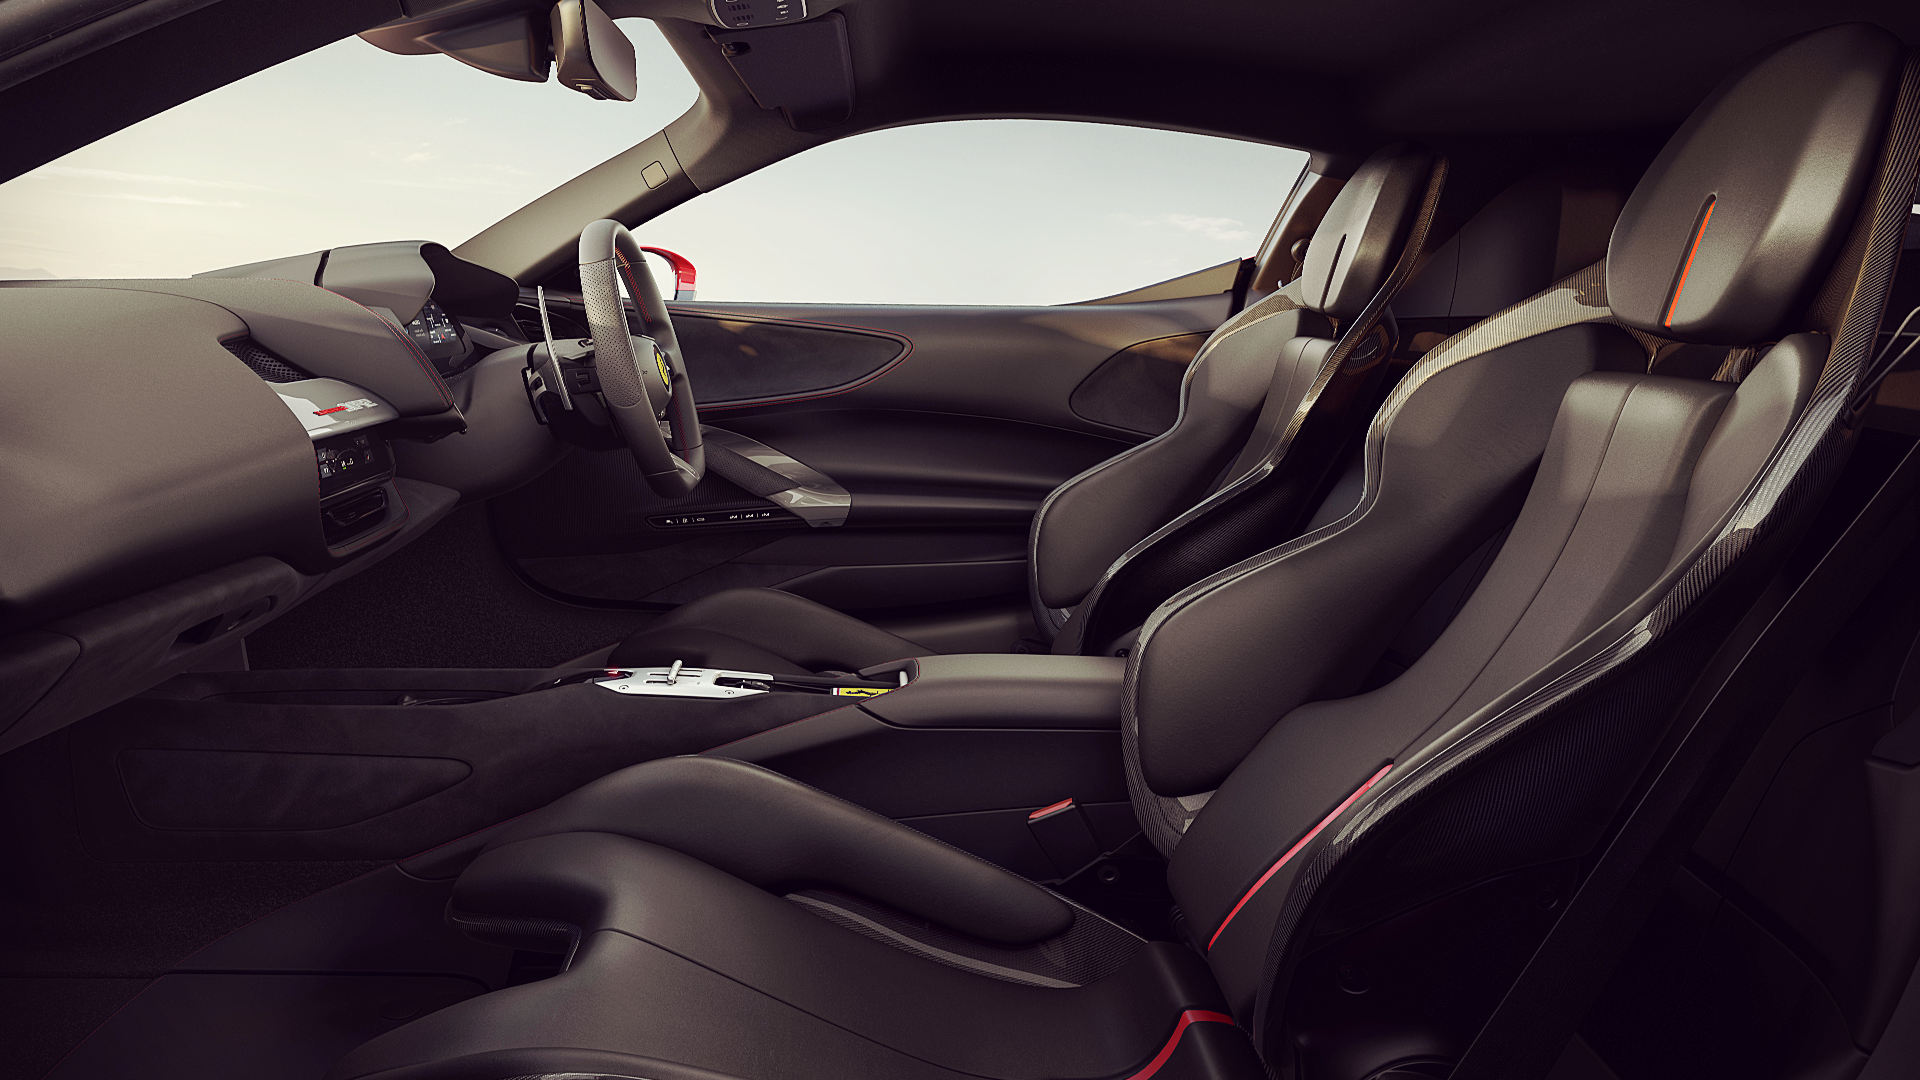 2020 Ferrari Sf90 Stradale Interior Wallpaper